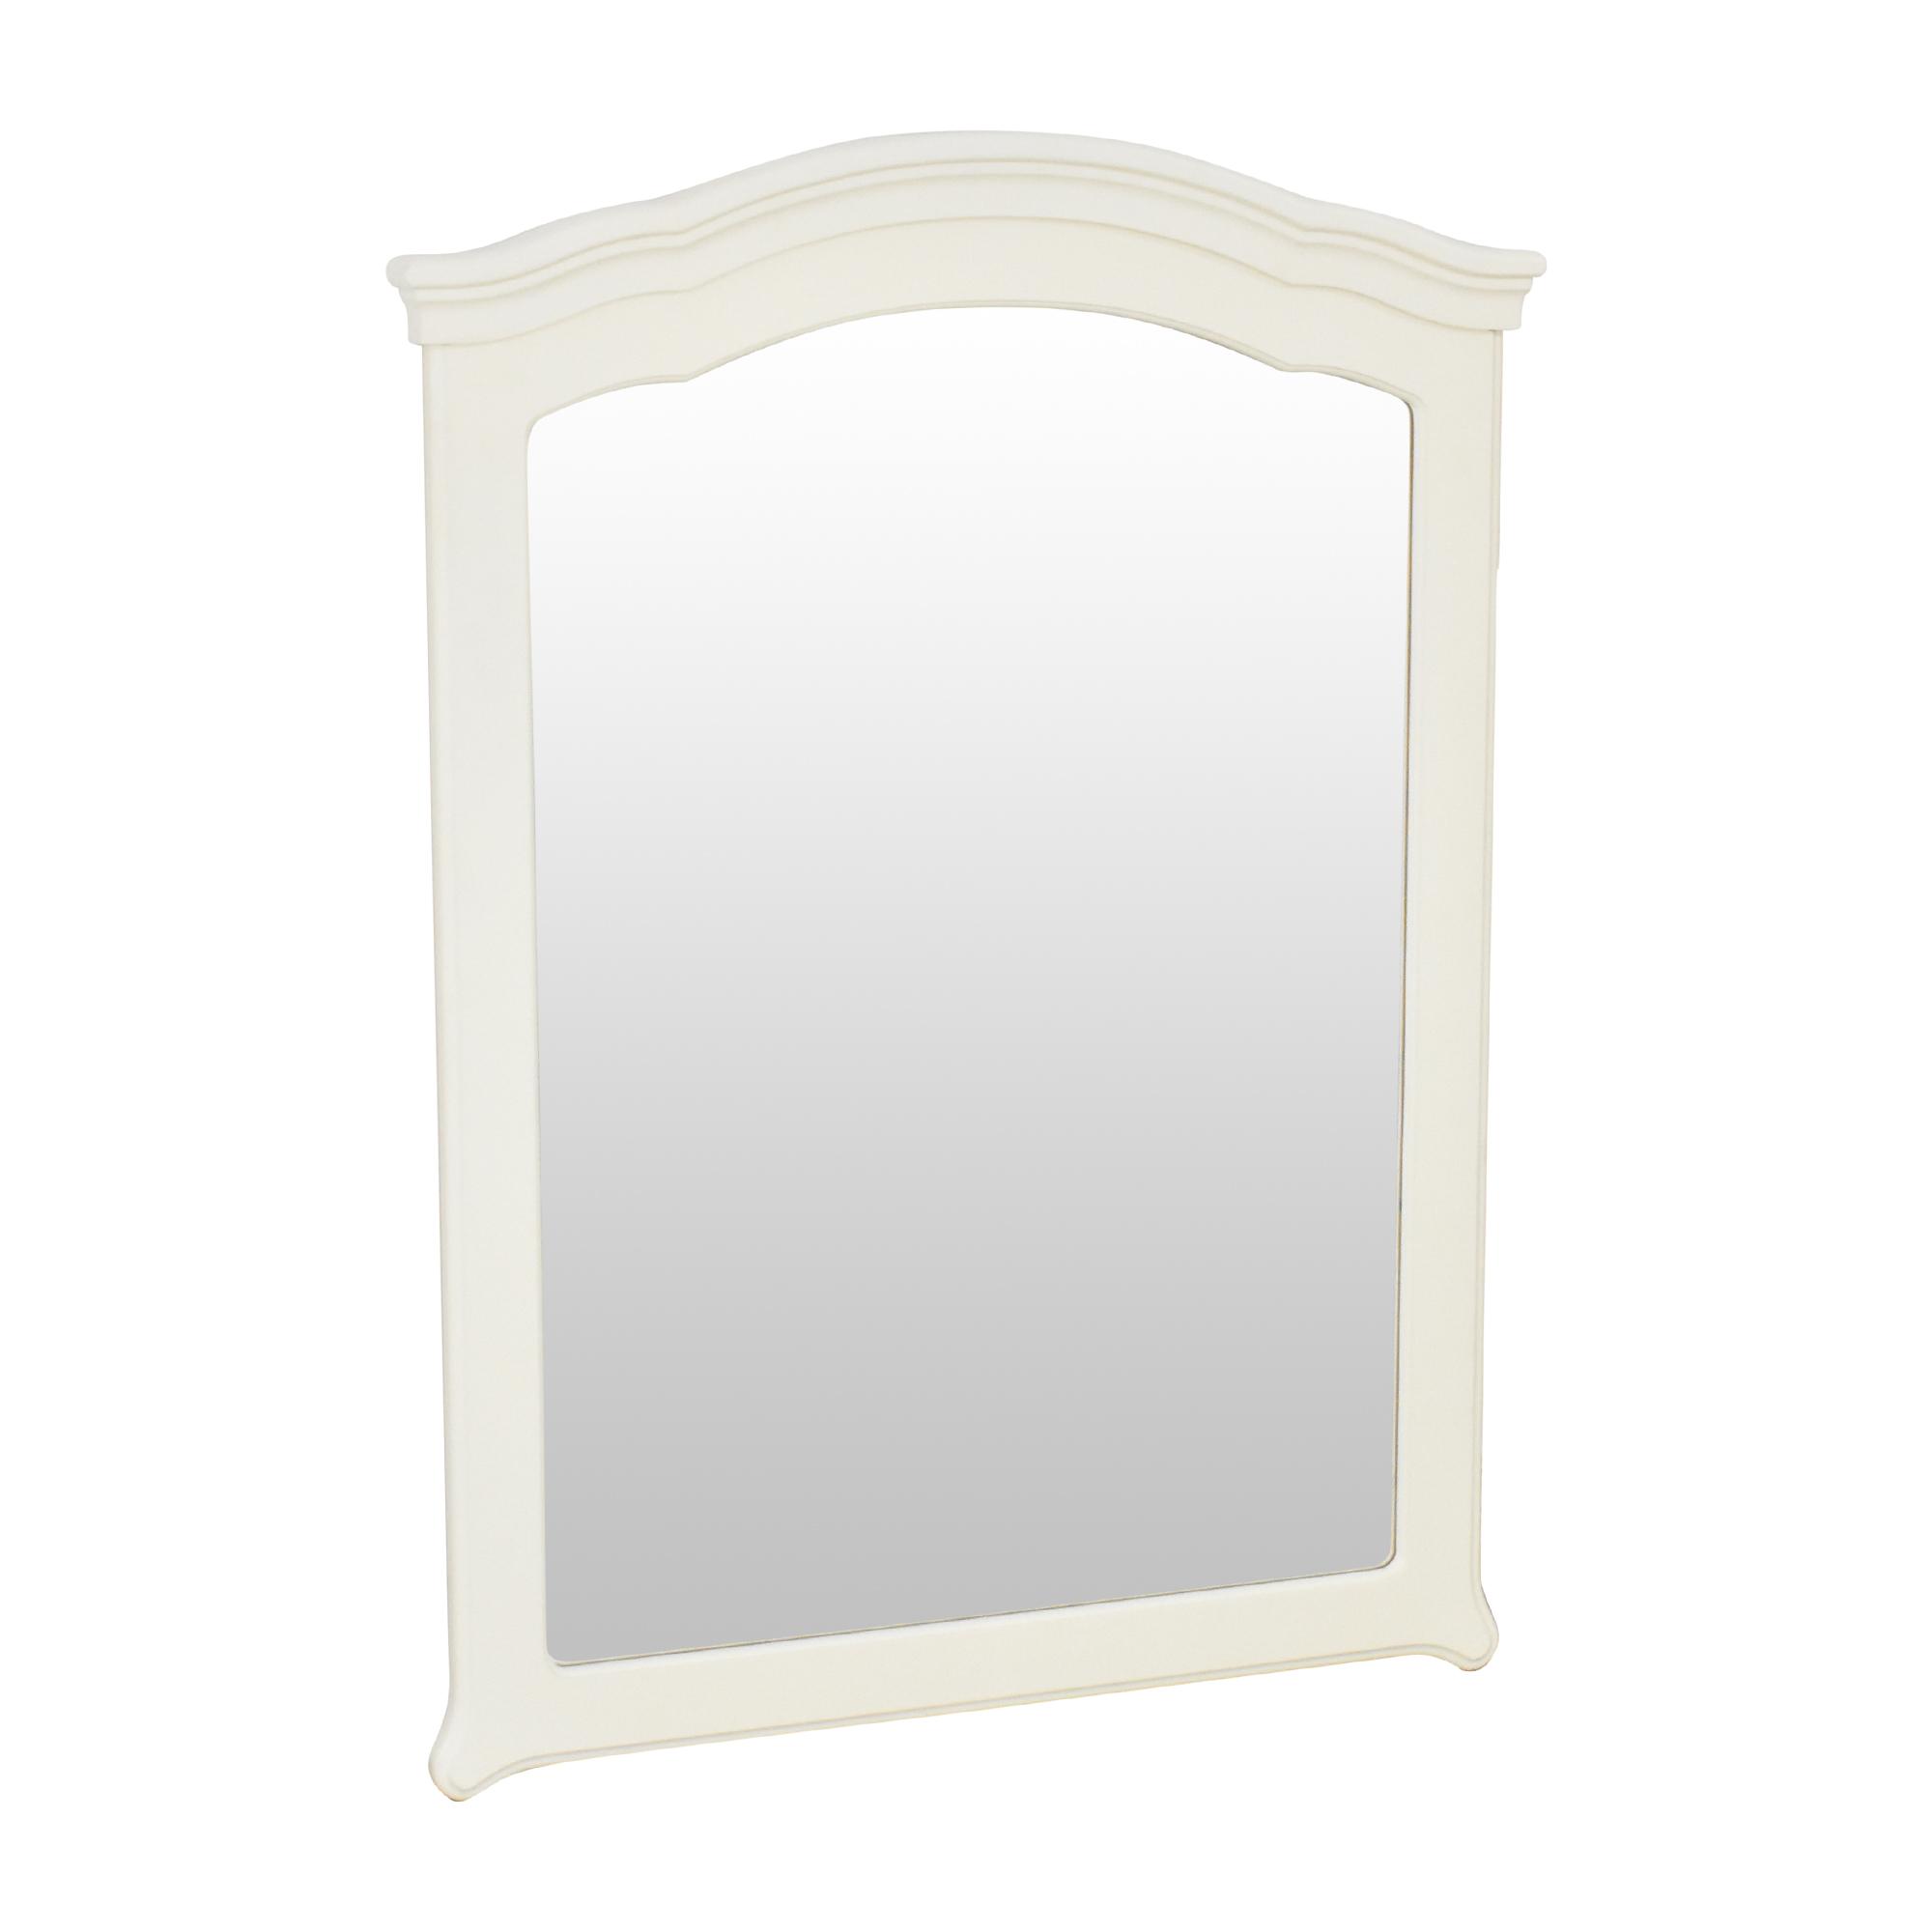 Natart Natart Framed Wall Mirror second hand